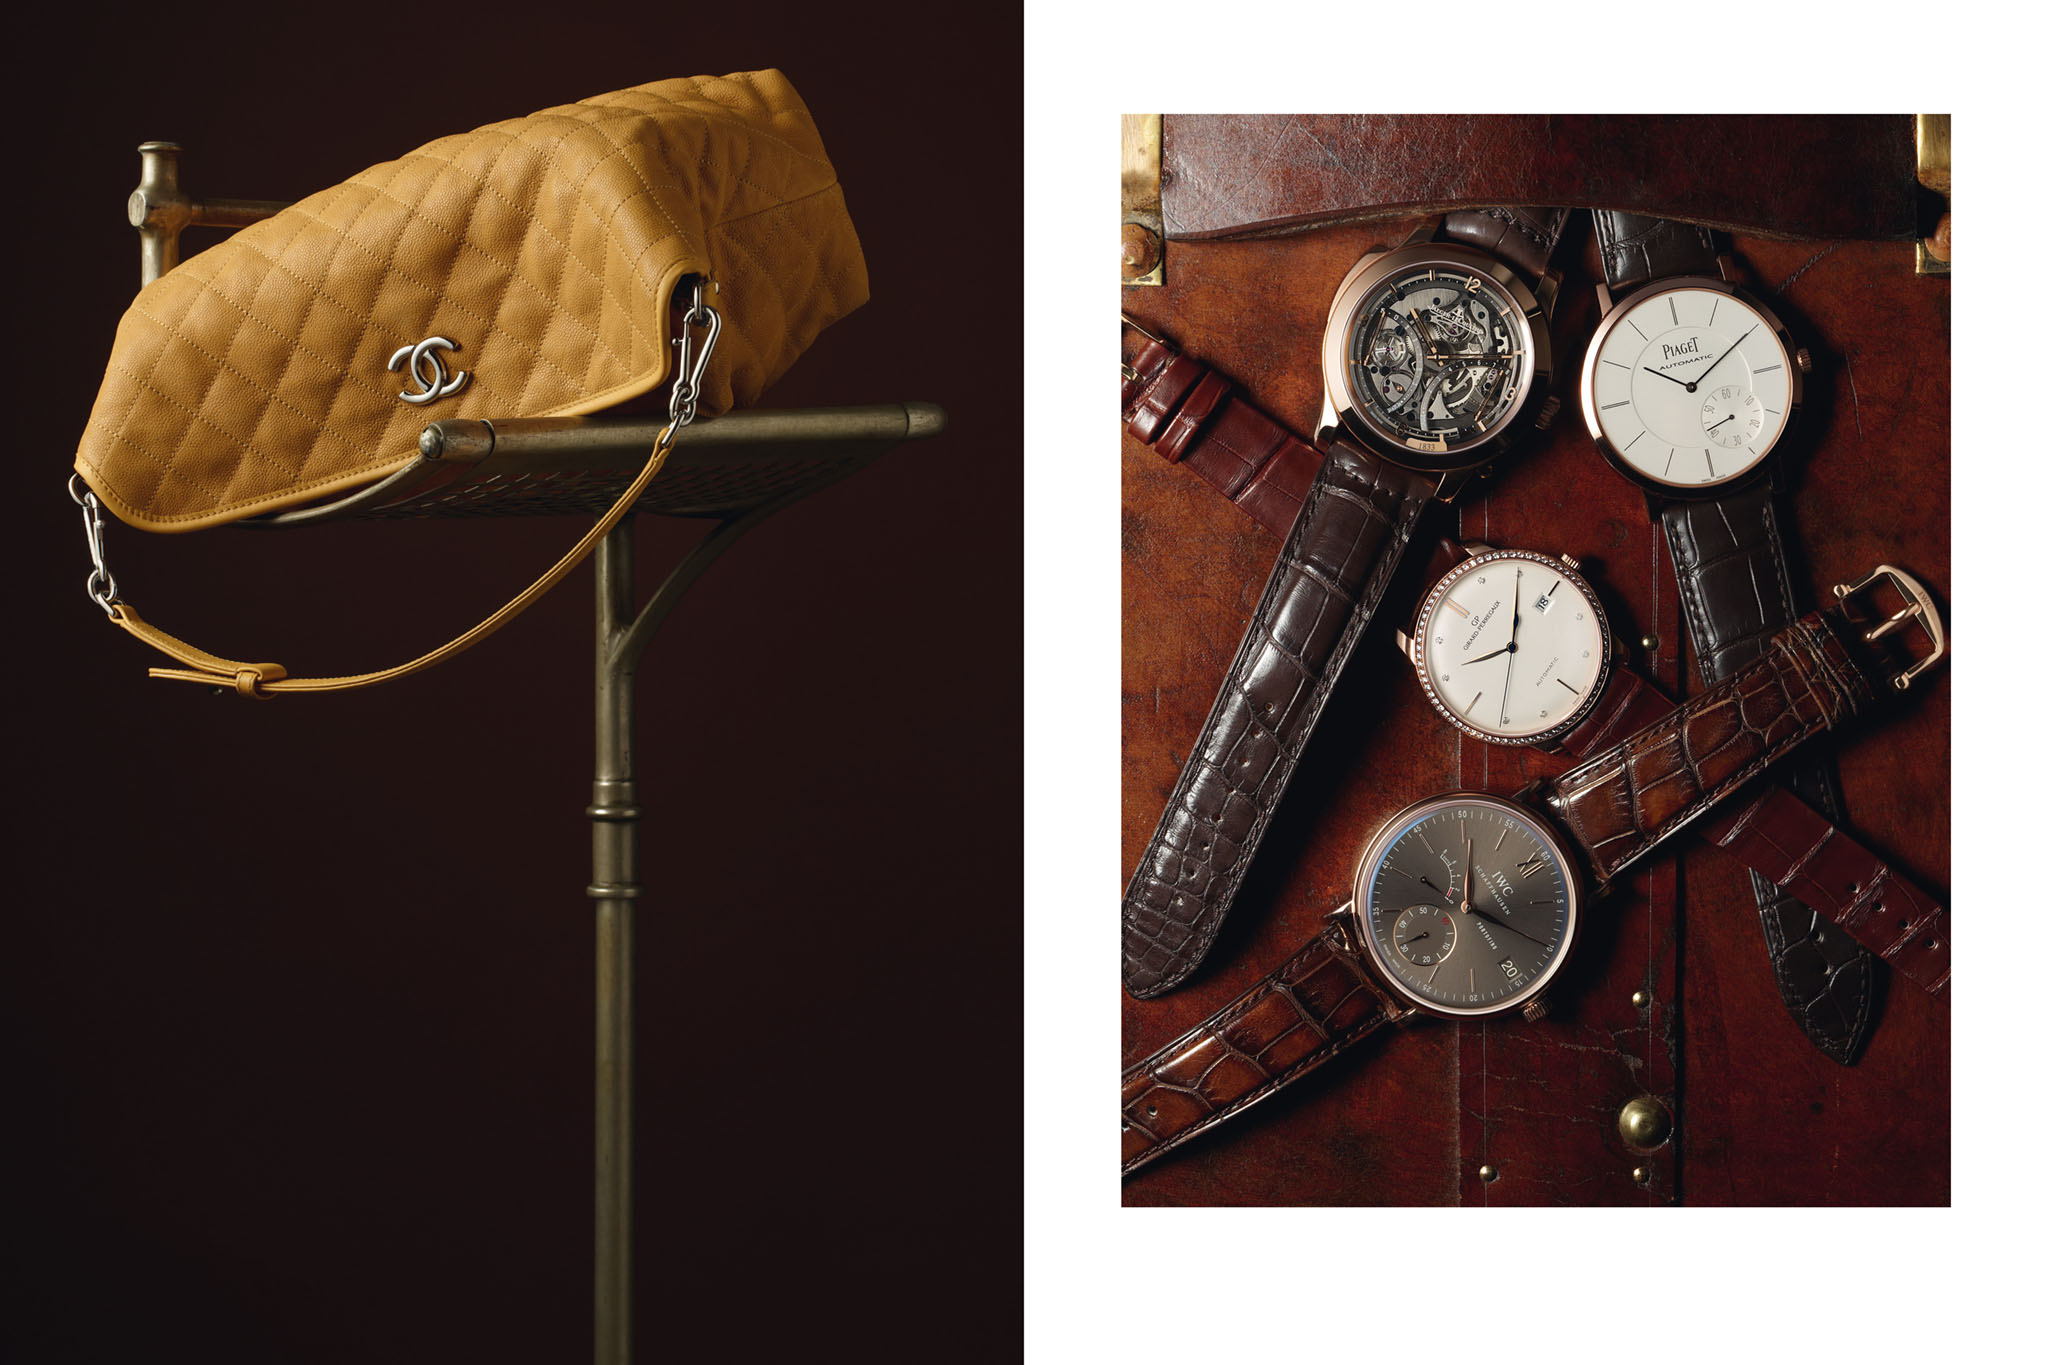 PRINTEMPS Catalogue Noël. Voyage de Luxe. Accessoires Horlogerie Omega Jaeger Lecoultre Piaget Girard Perregaux IWC Maroquinerie Chanel